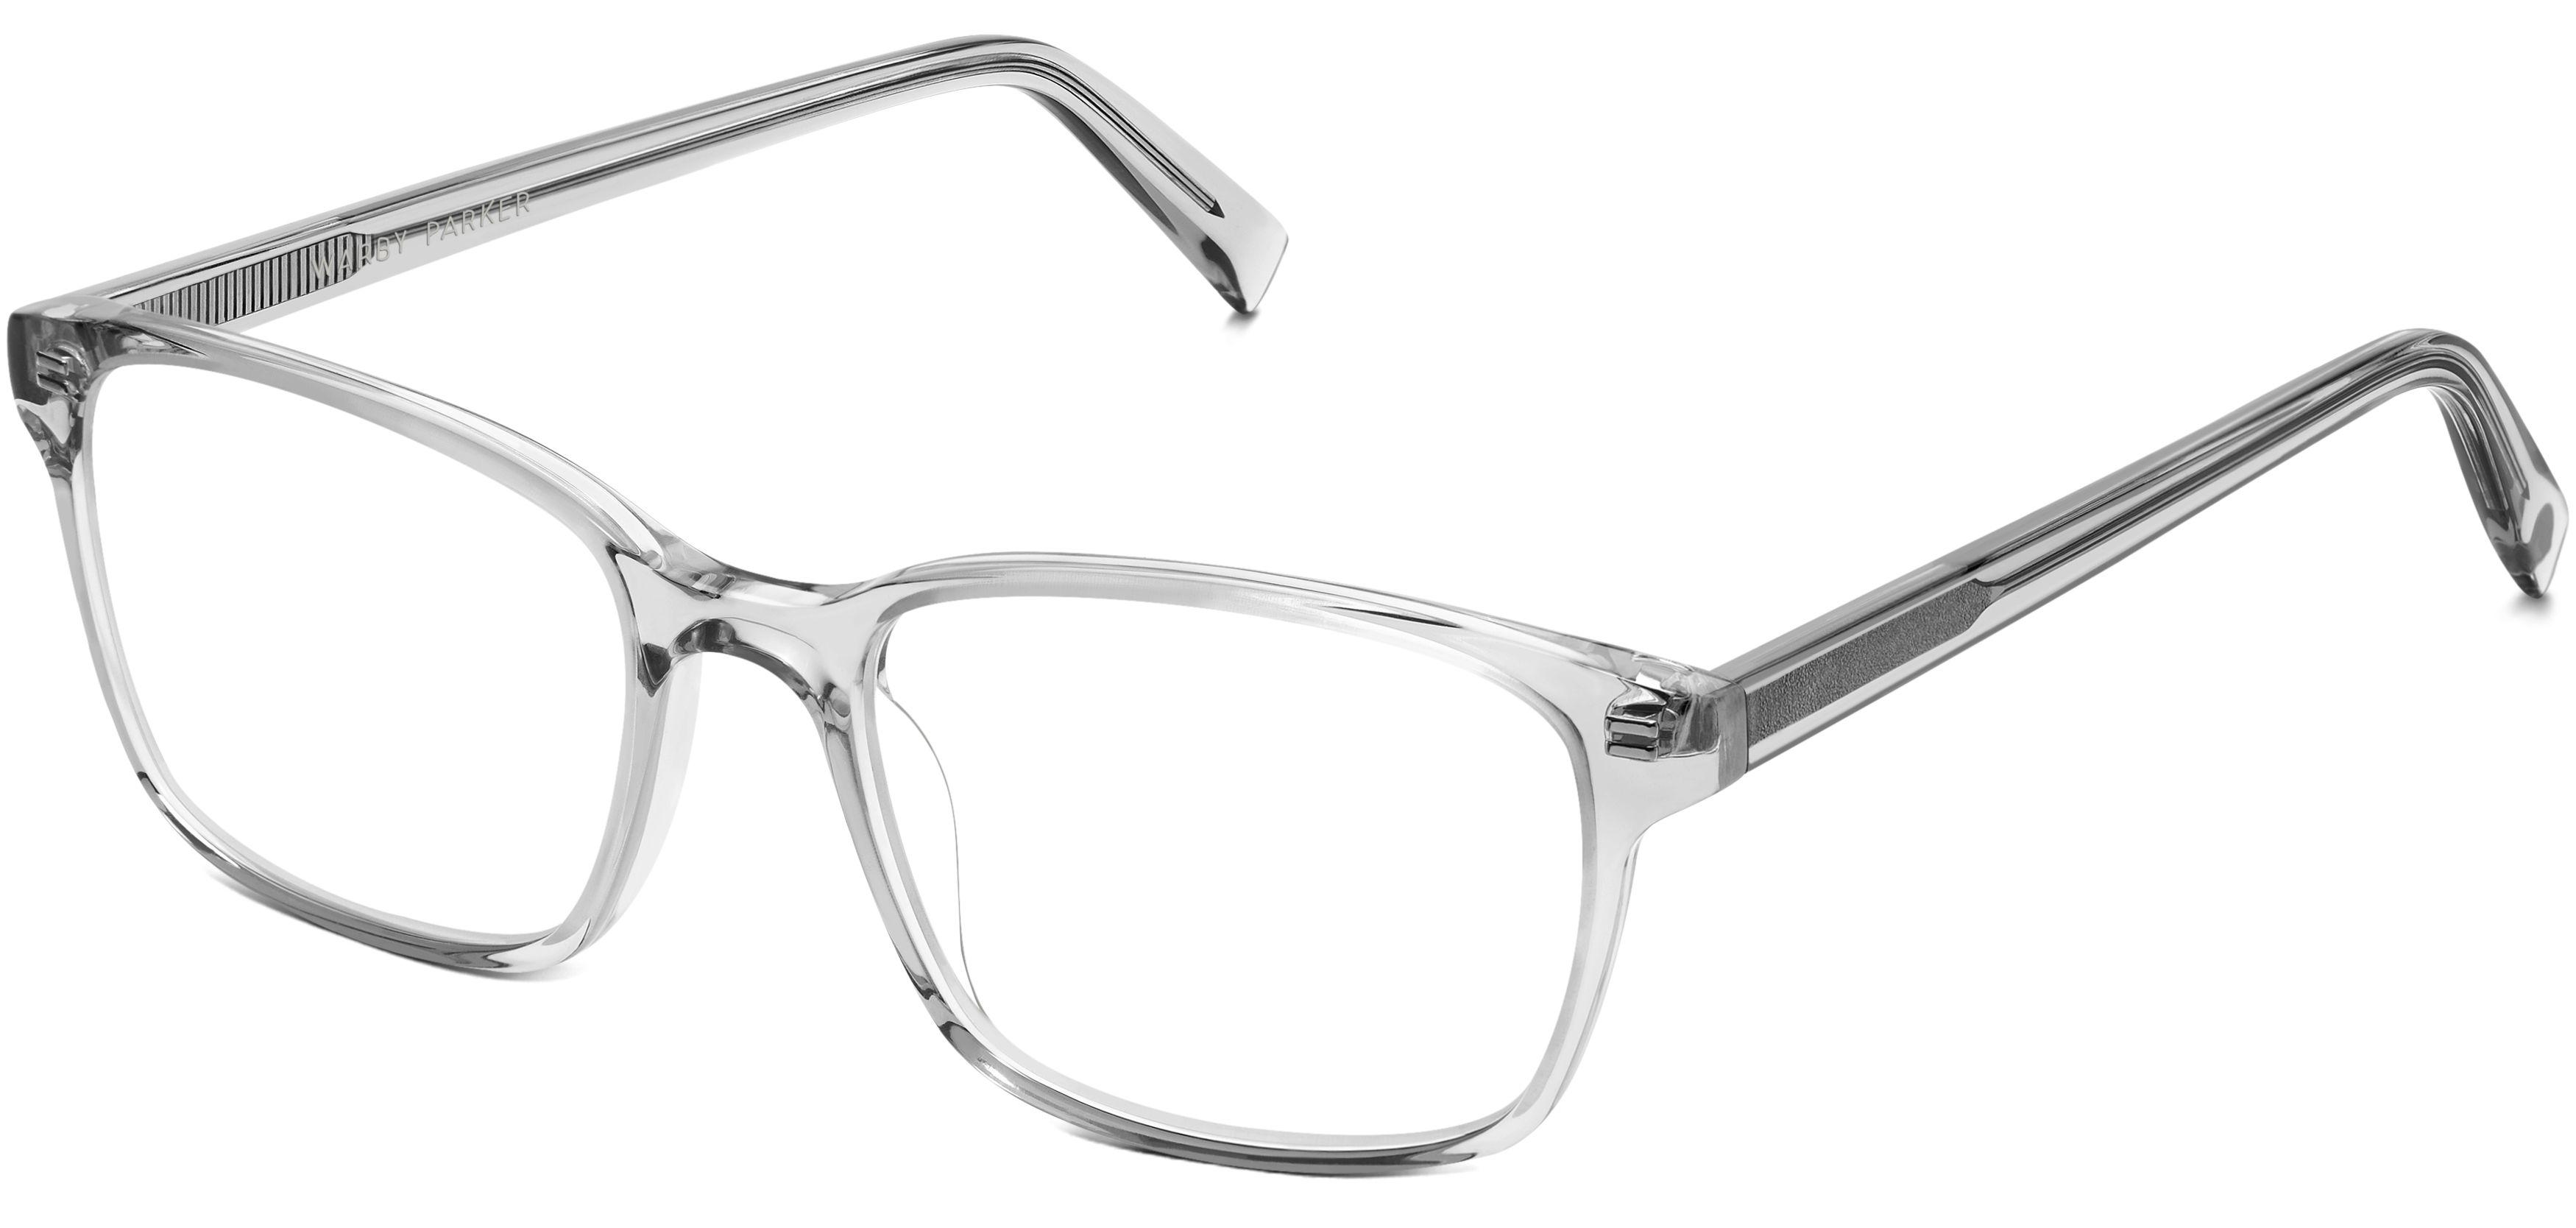 8c0f83d5a1 Brady Eyeglasses in Sea Glass Grey for Men